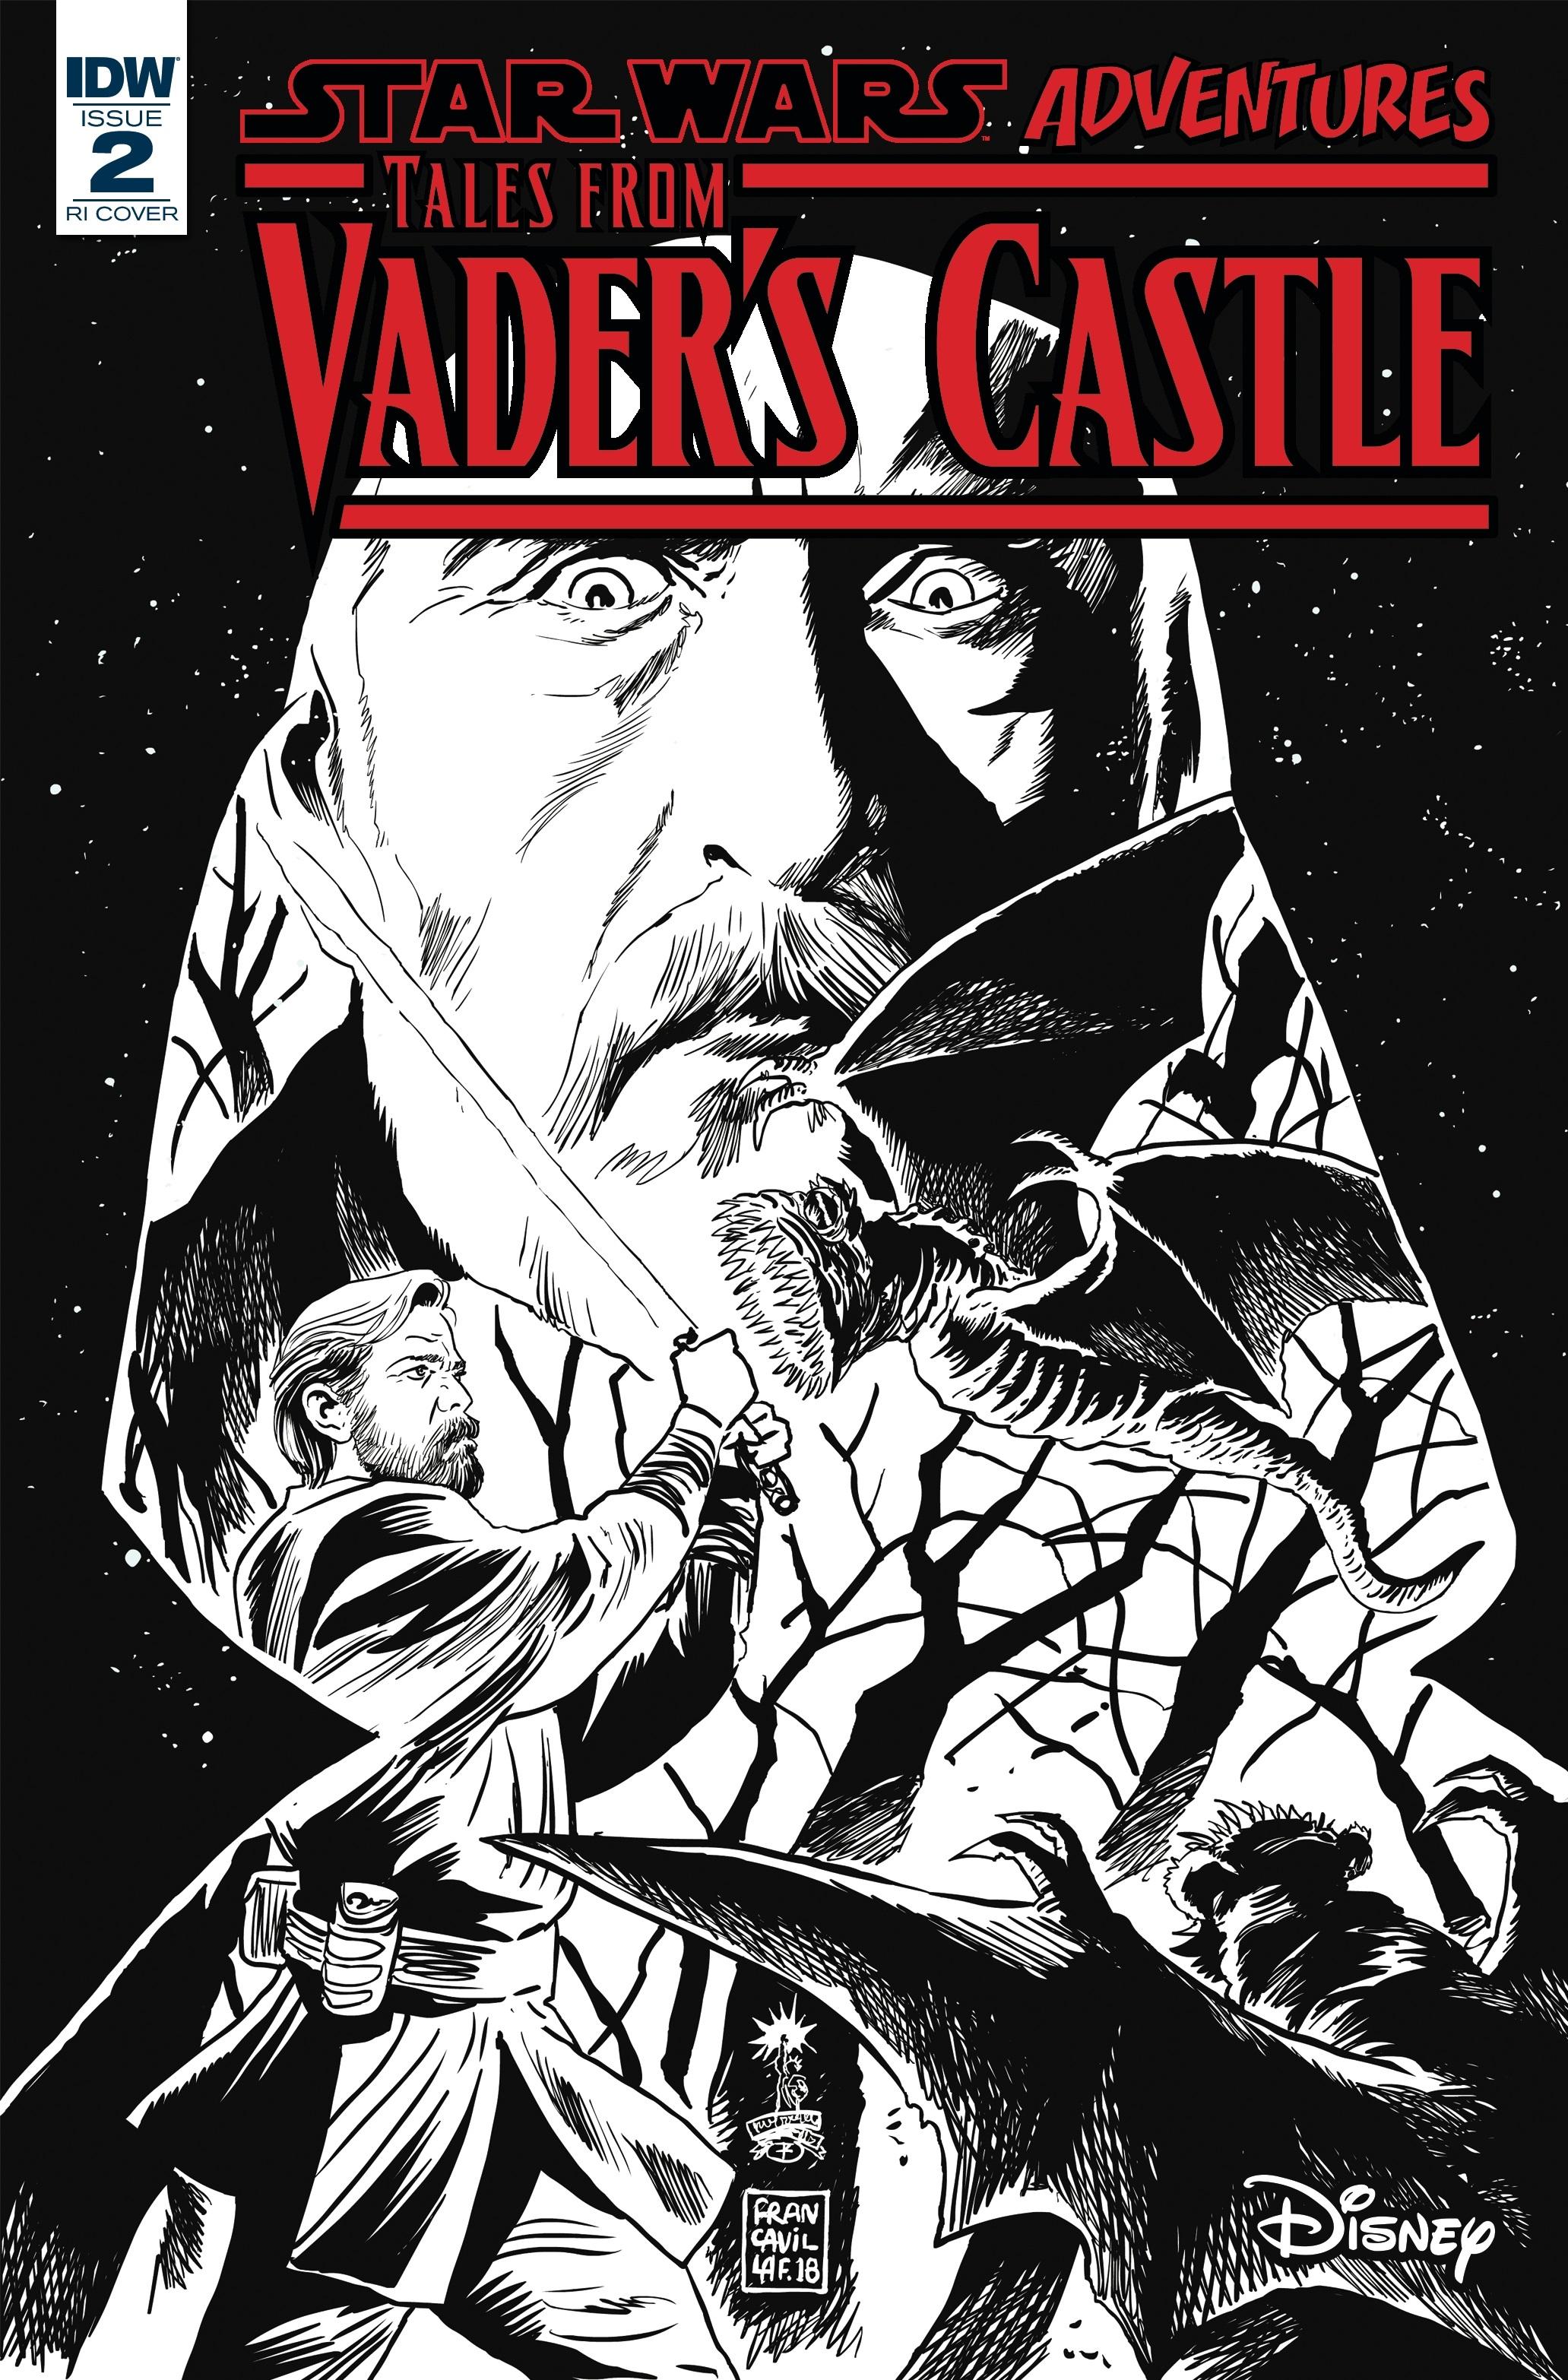 Star Wars Adventures: Tales from Vader's Castle #2 (Francesco Francavilla Black & White Variant Cover) (10.10.2018)